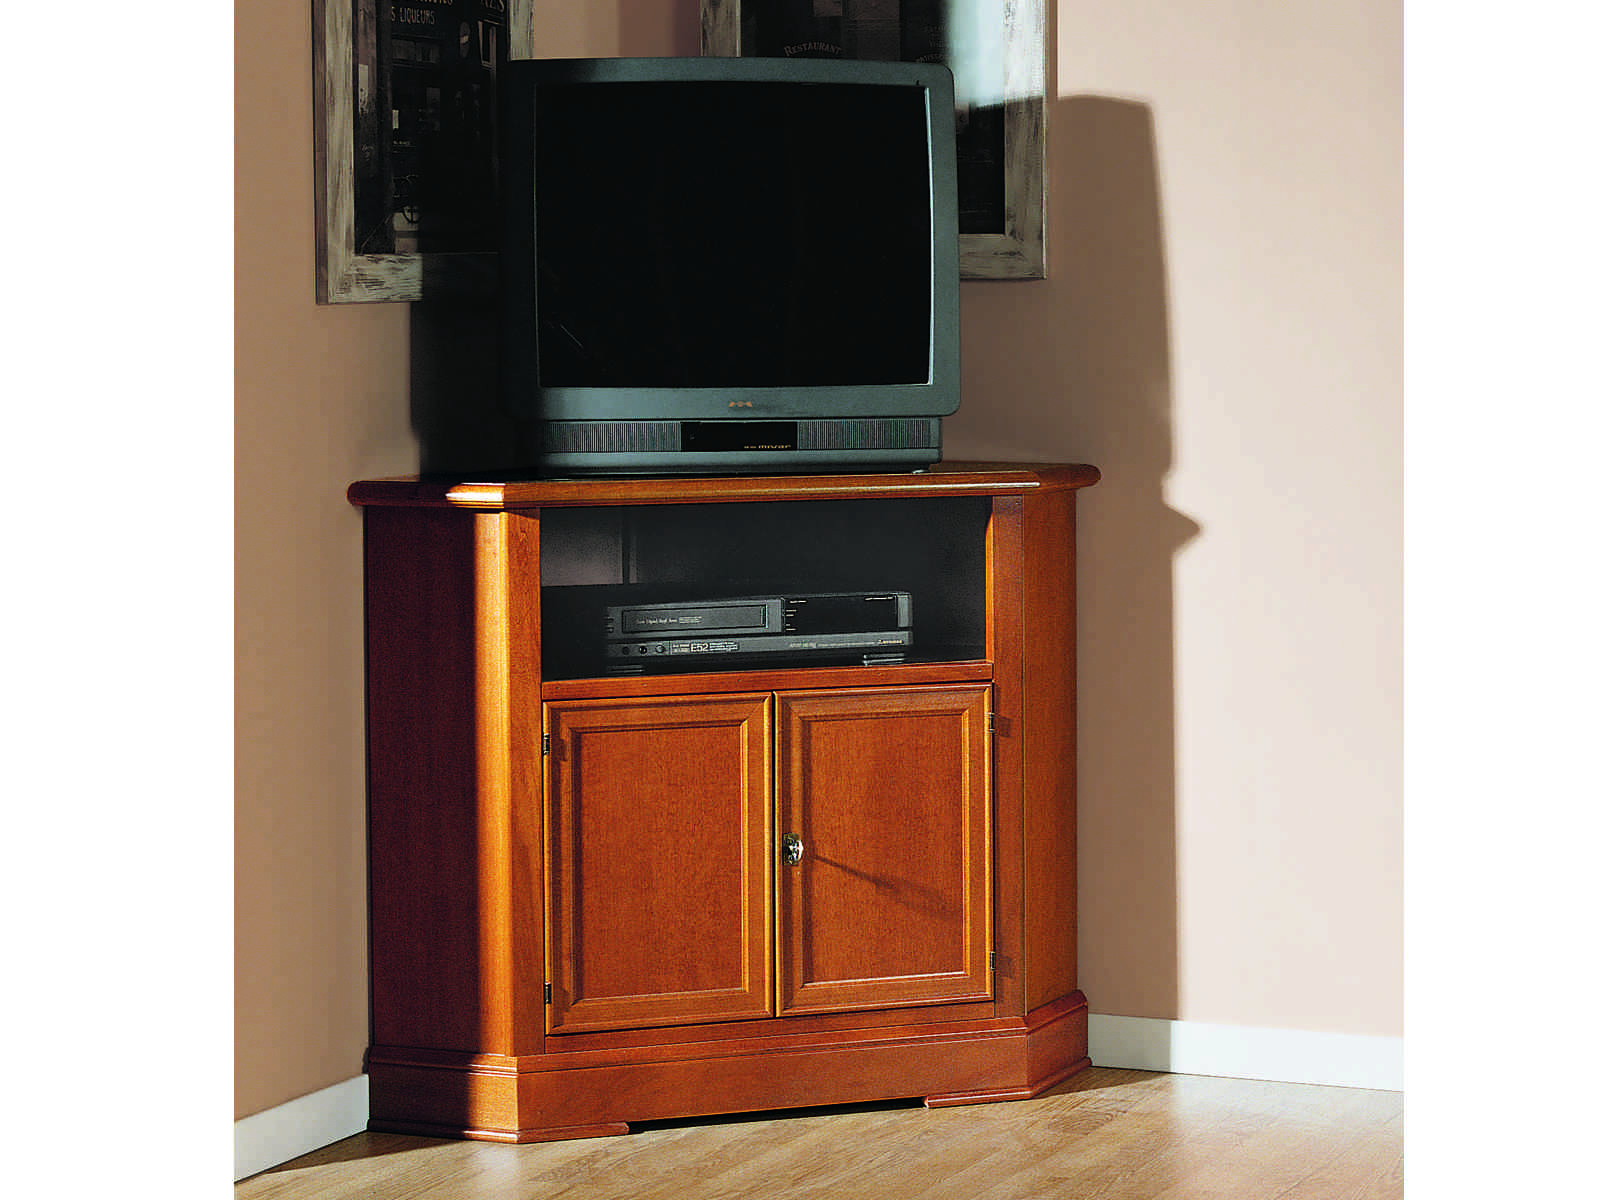 RRustikálna rohová TV skrinka